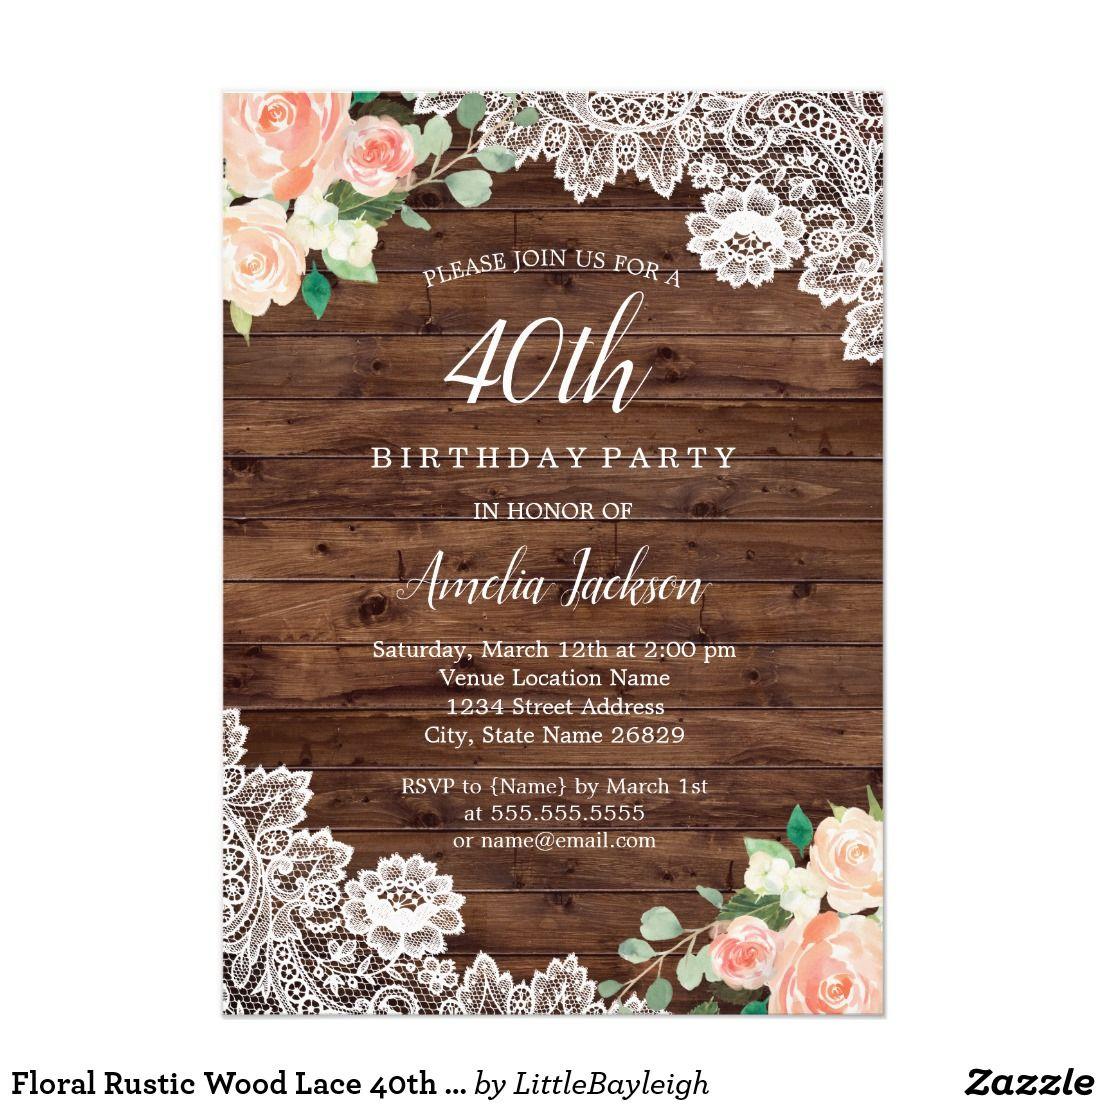 Floral Rustic Wood Lace 40th Birthday Invitation | Birthday ...